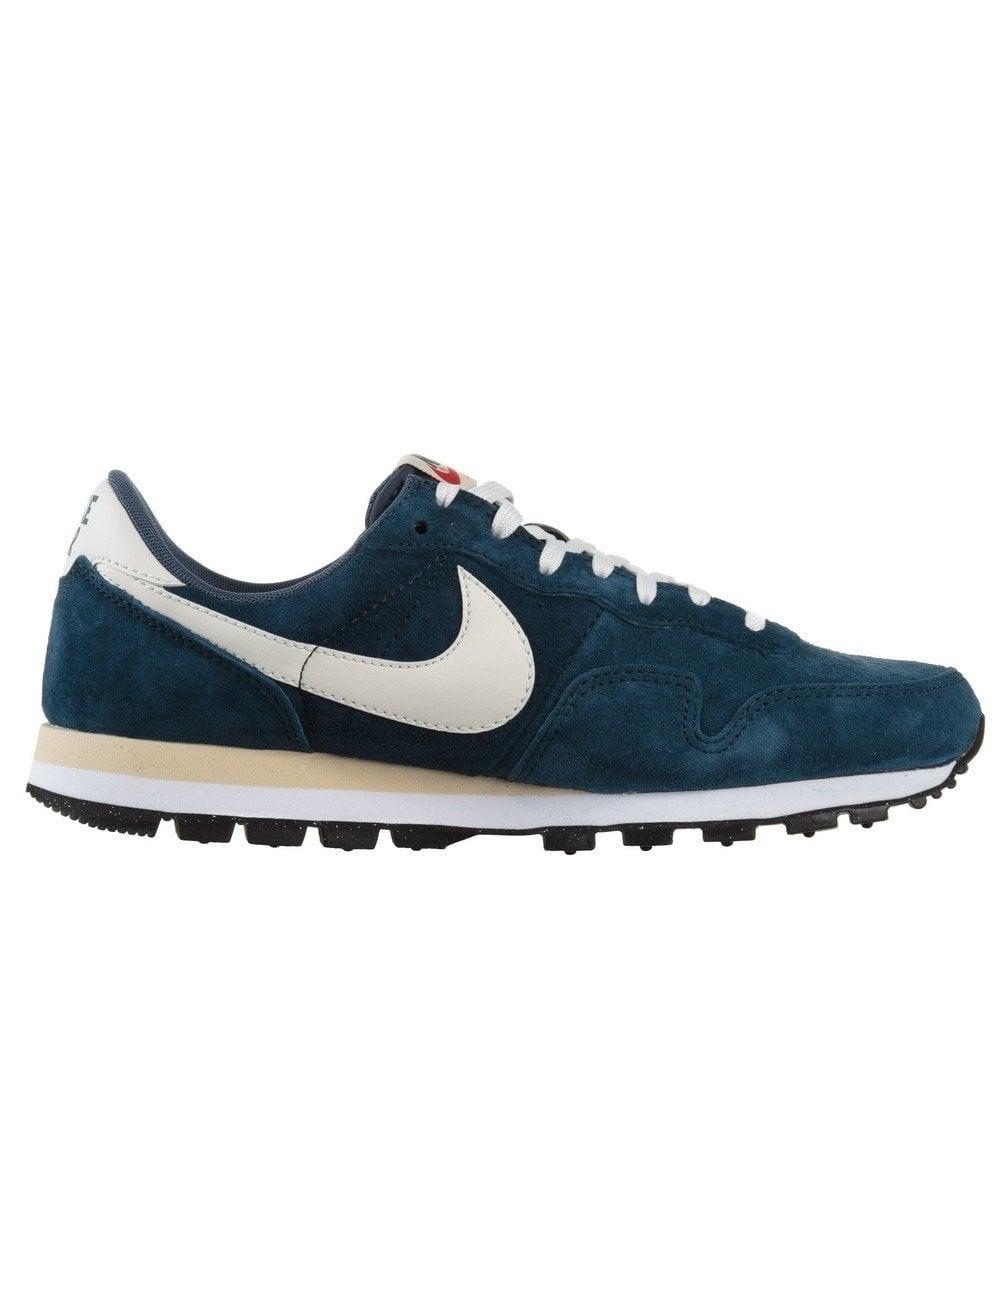 buy popular 13d20 1d2e0 Nike Air Pegasus 83 PGS LTR Shoes - Squadron Blue